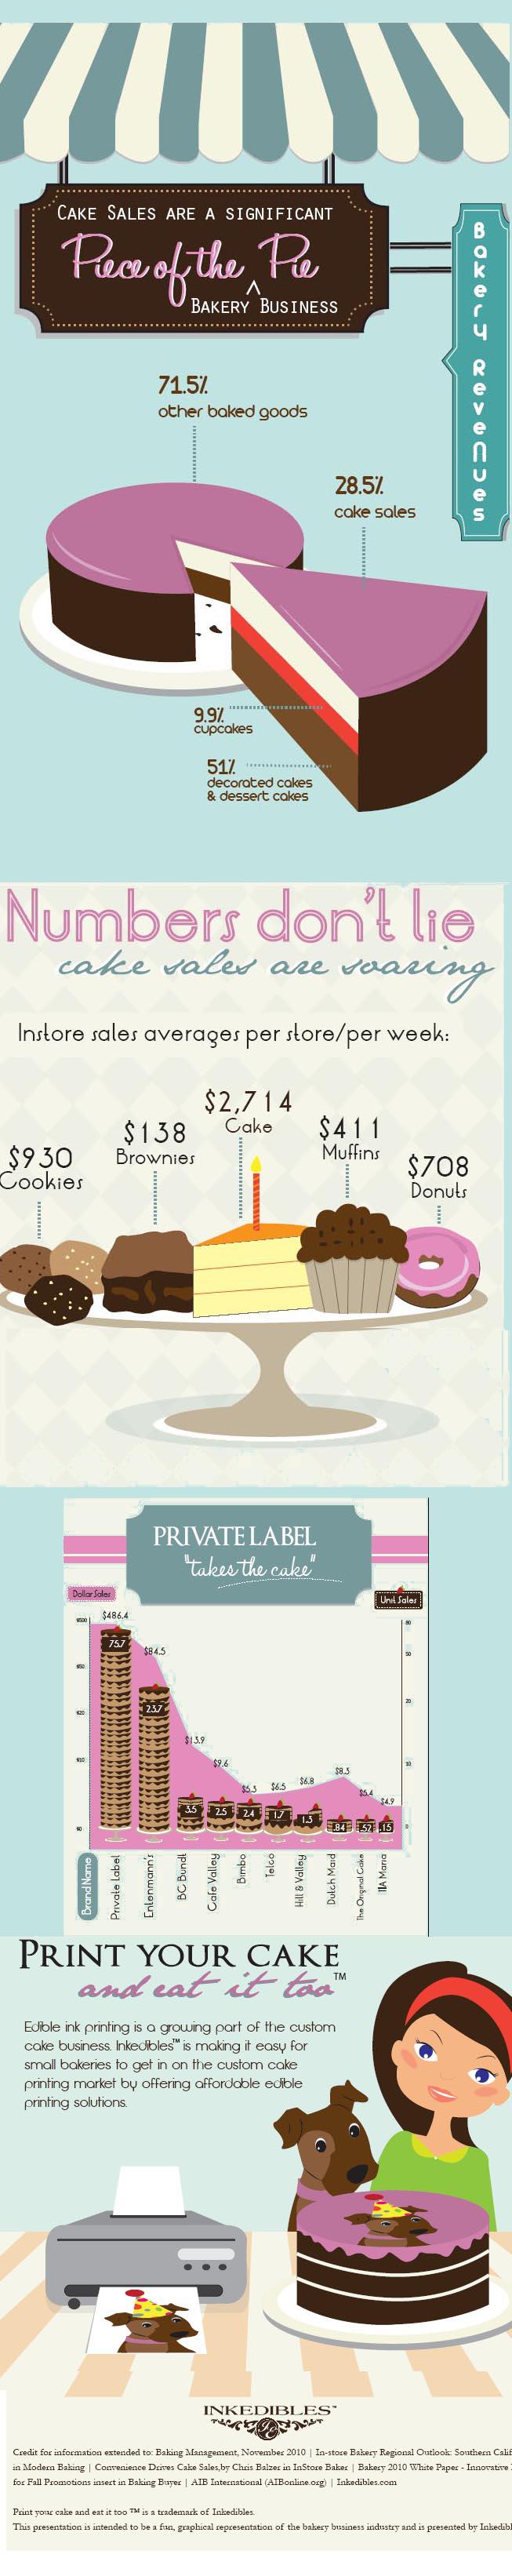 Cake Sales Trends